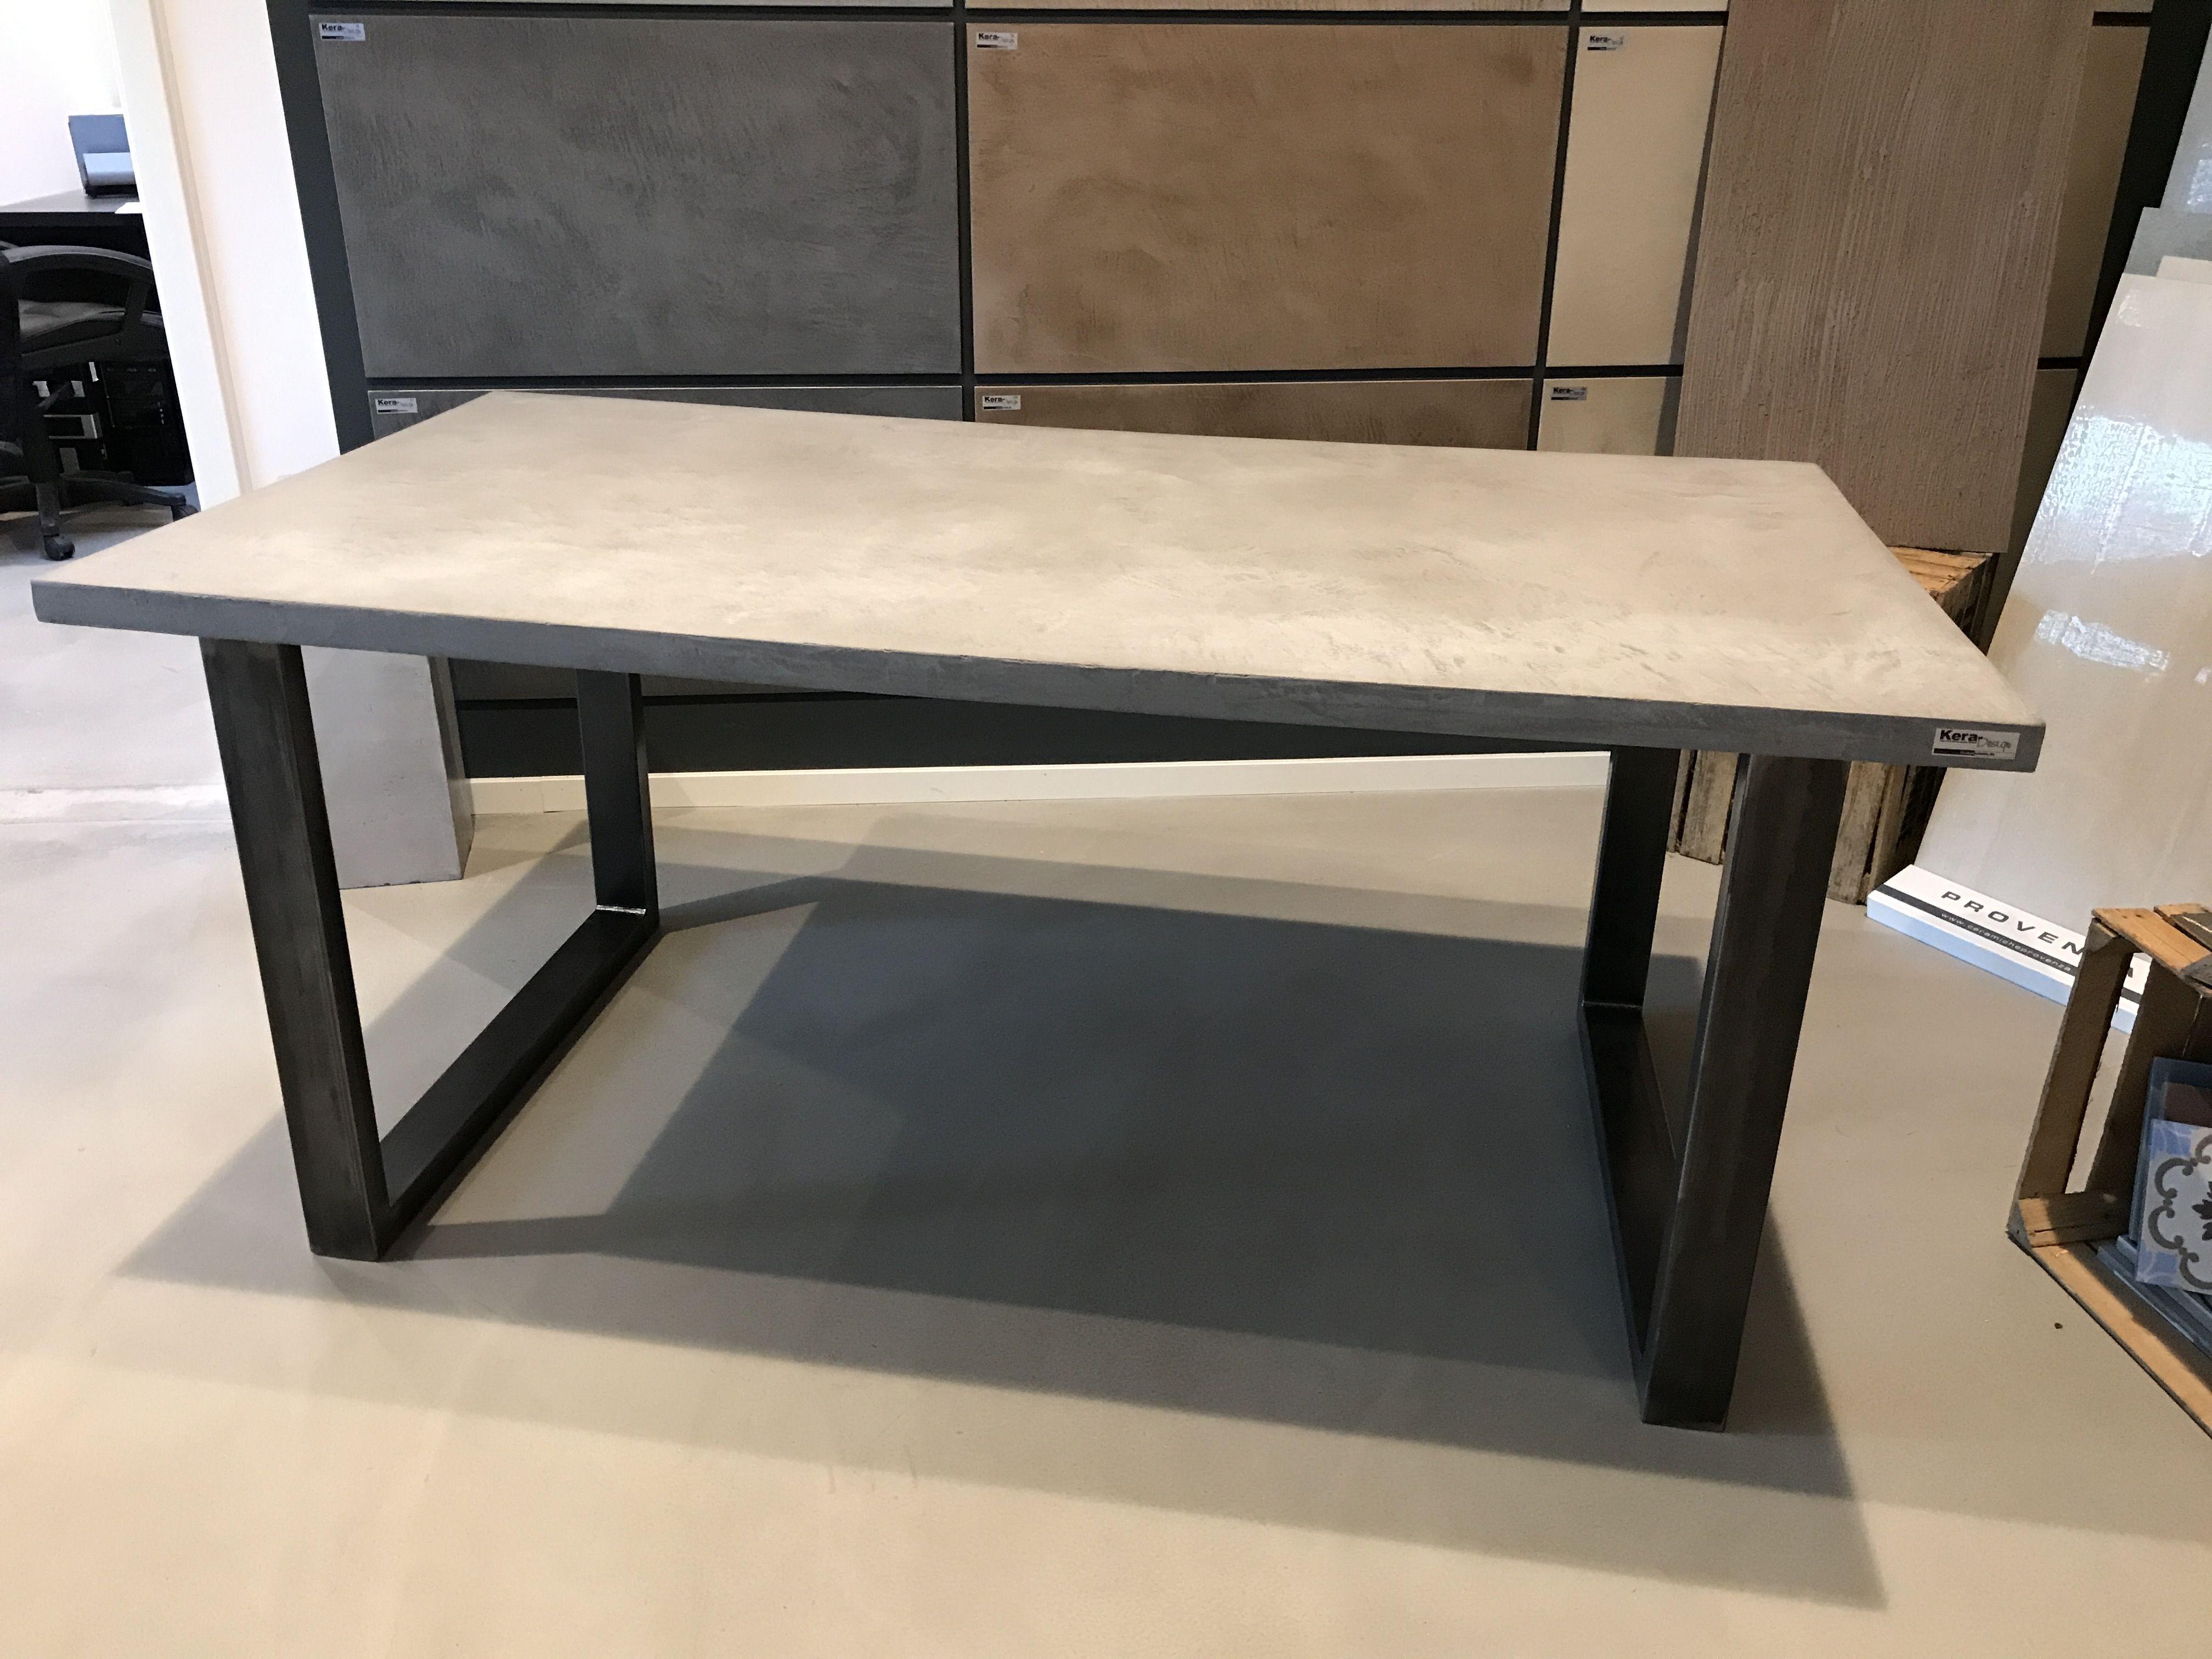 diy anleitung beton tisch selber bauen mit carameo beton cire